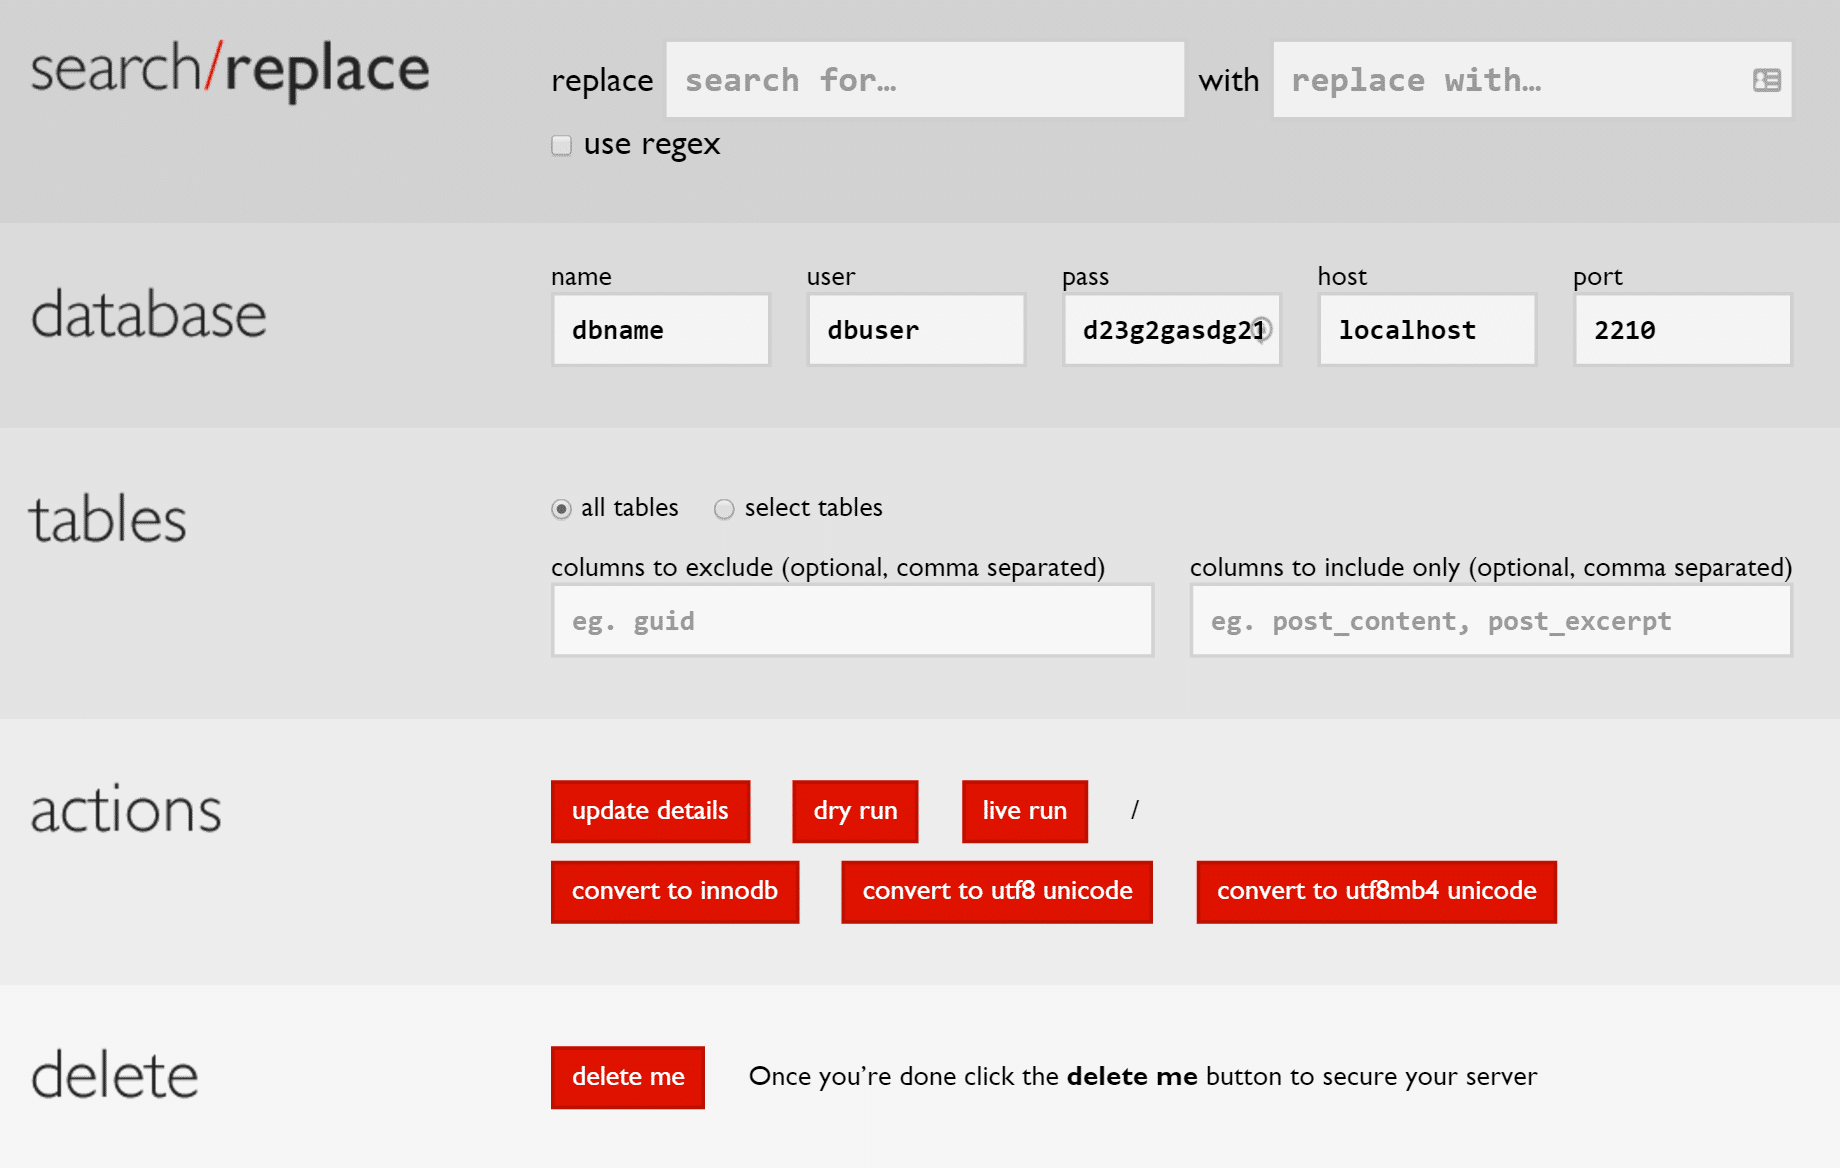 Opzioni search replace